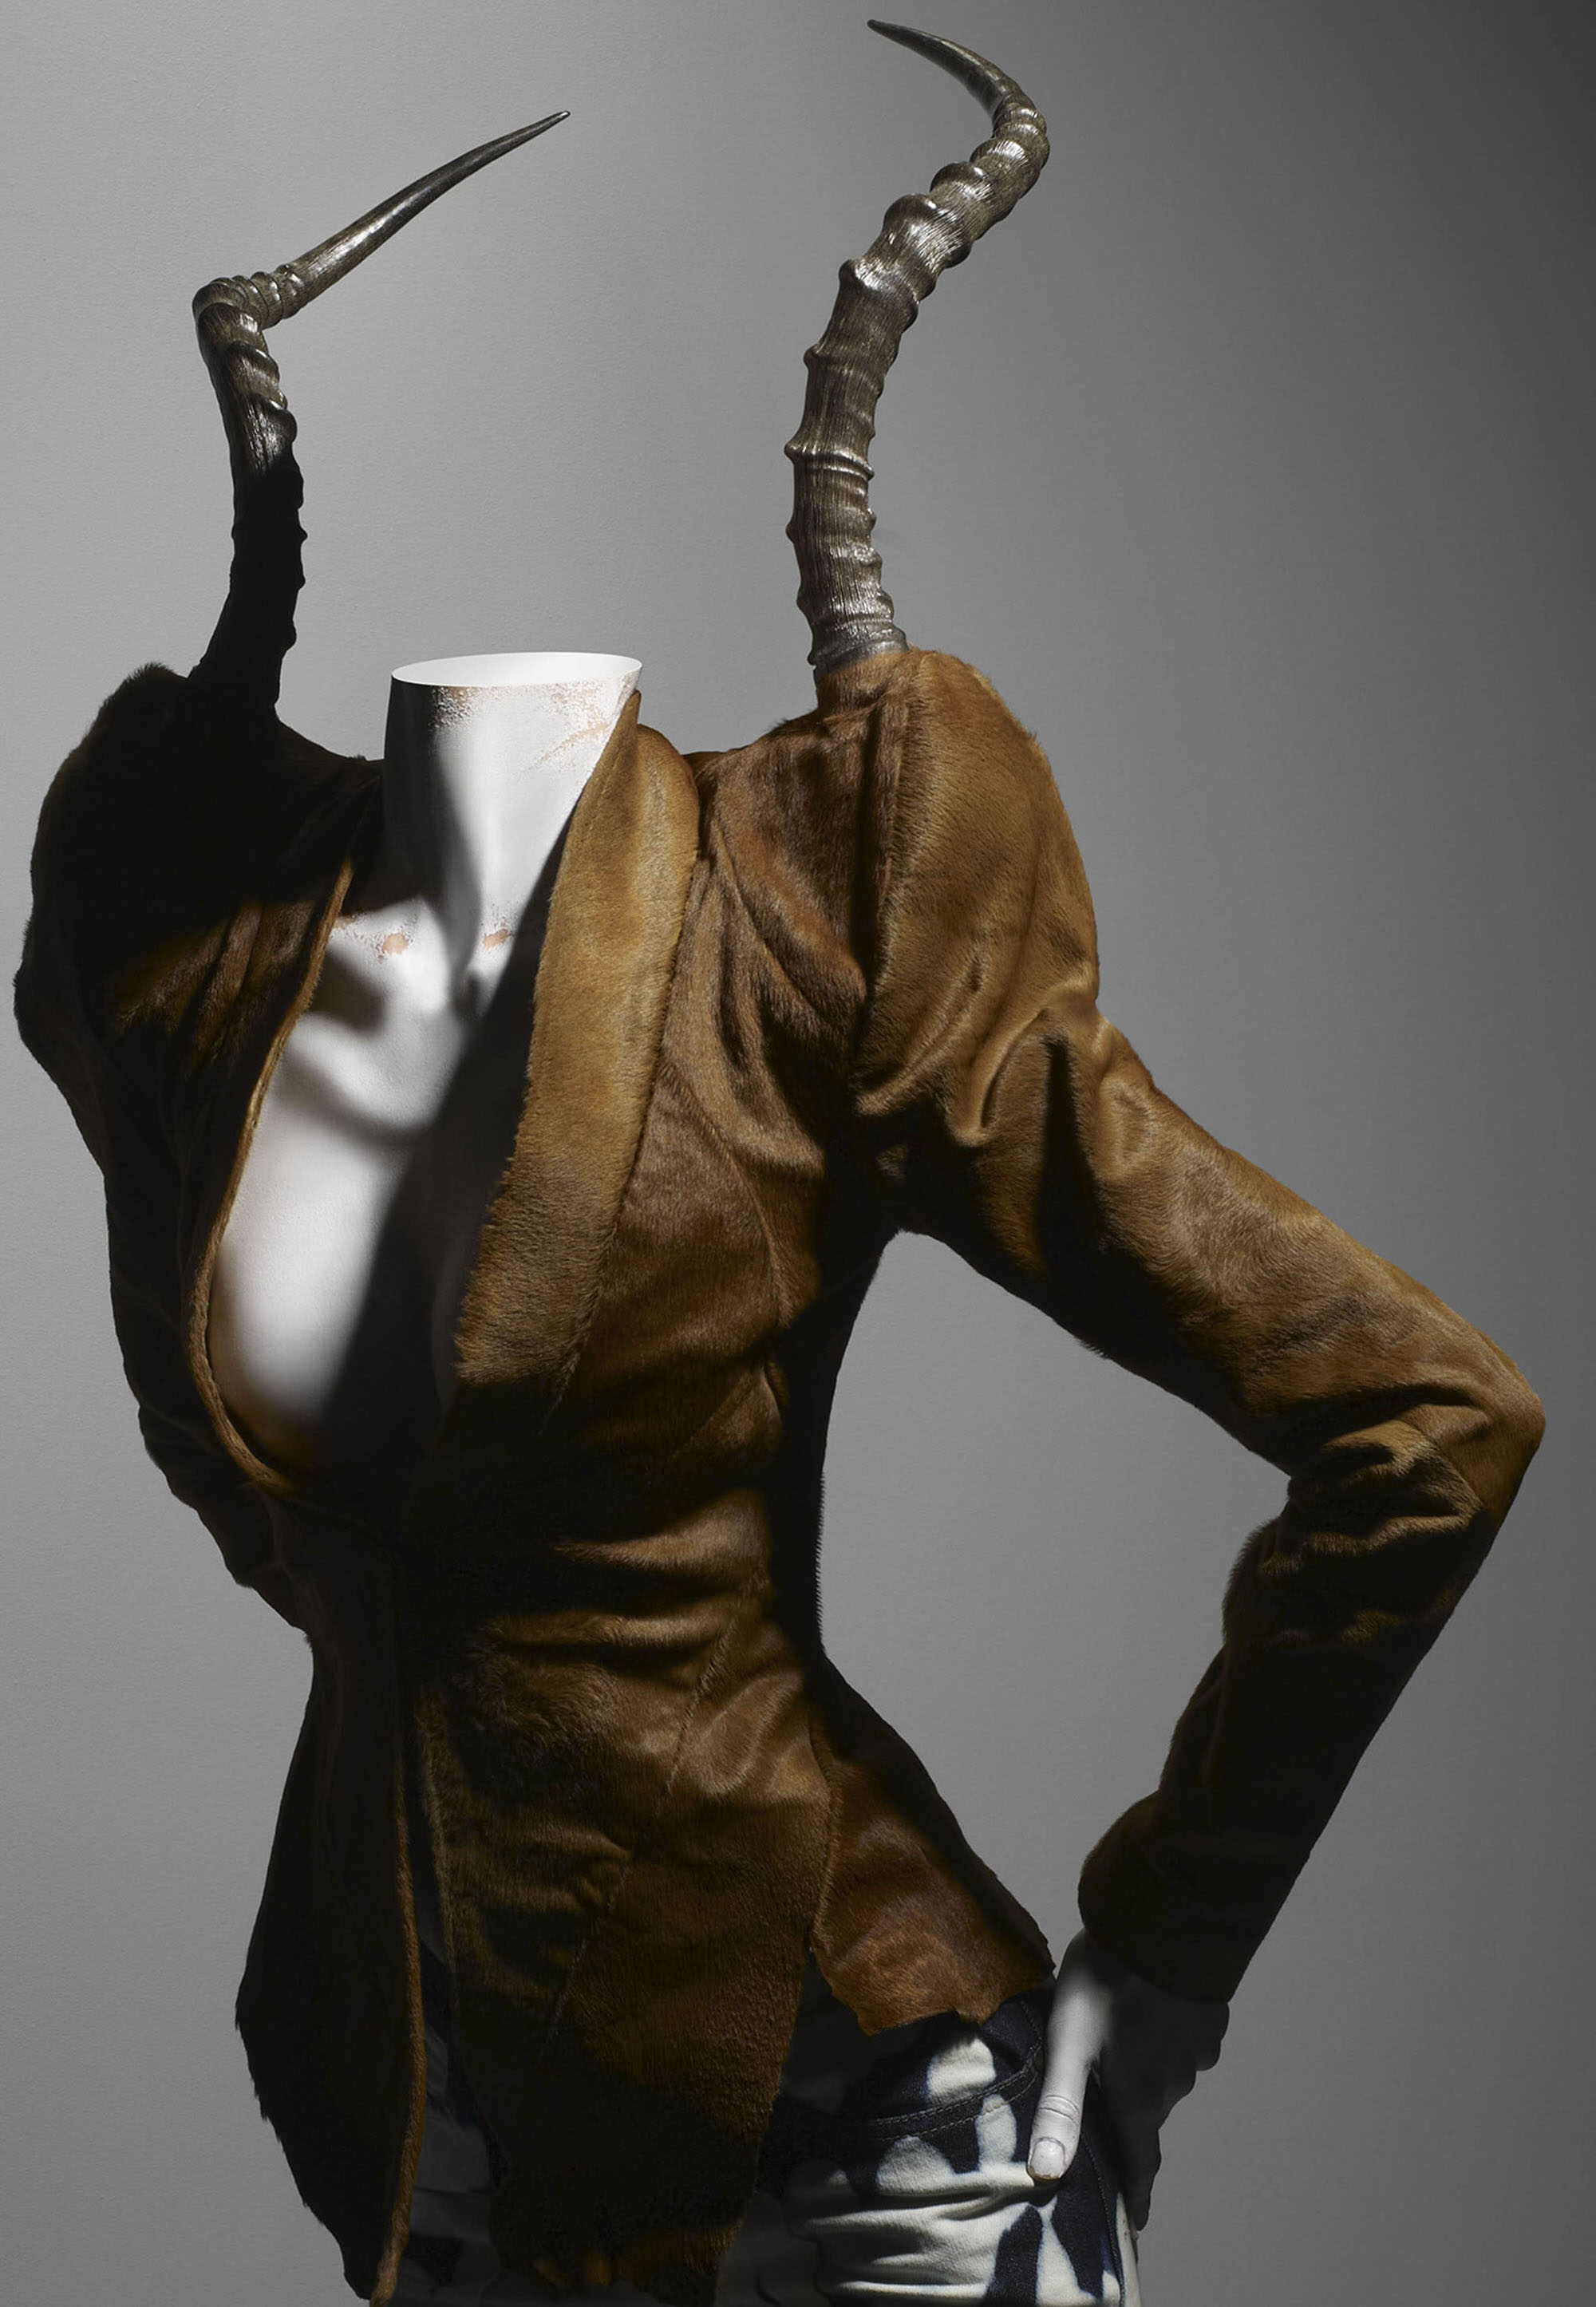 Alexander McQueen, A/W 1997/8, Jacket